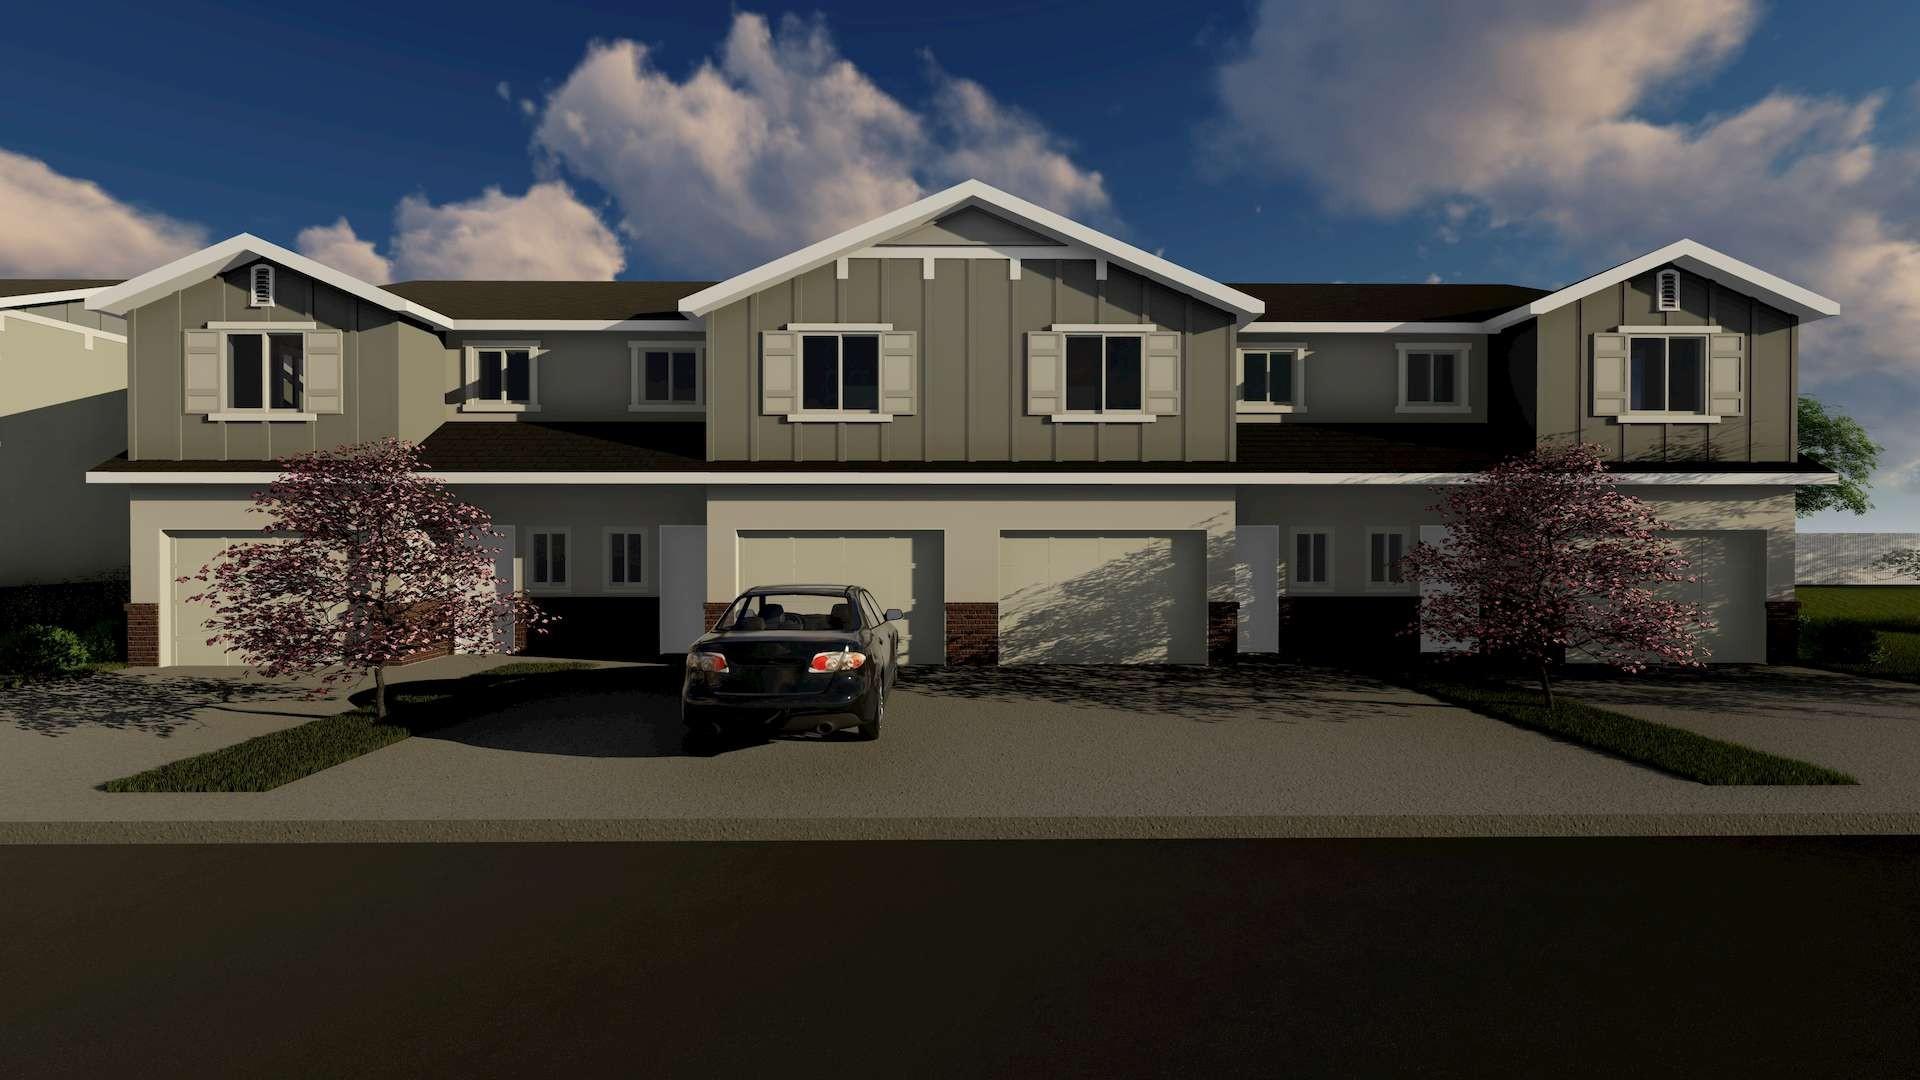 fourplexes for sale near Boise, Idaho